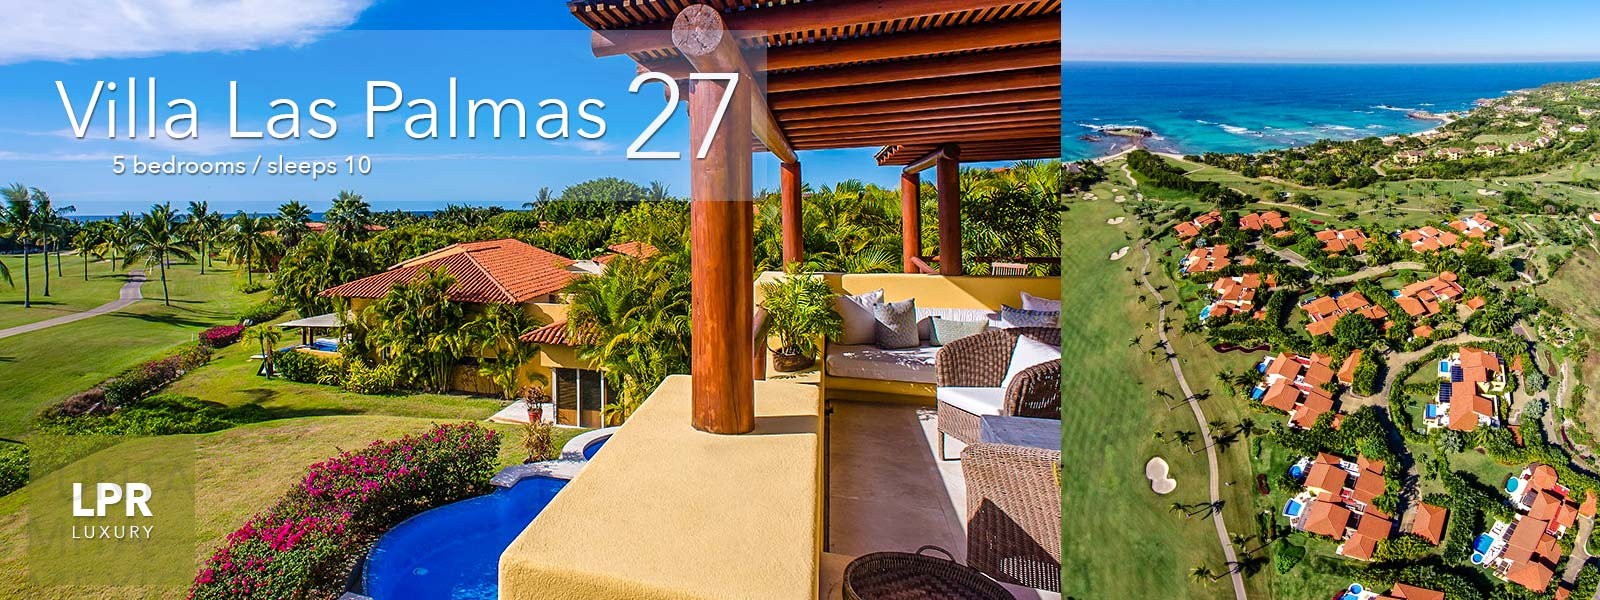 Villa Las Palmas 27 - Punta Mita Resort Real Estate - Punta Mita Vacation Rentals